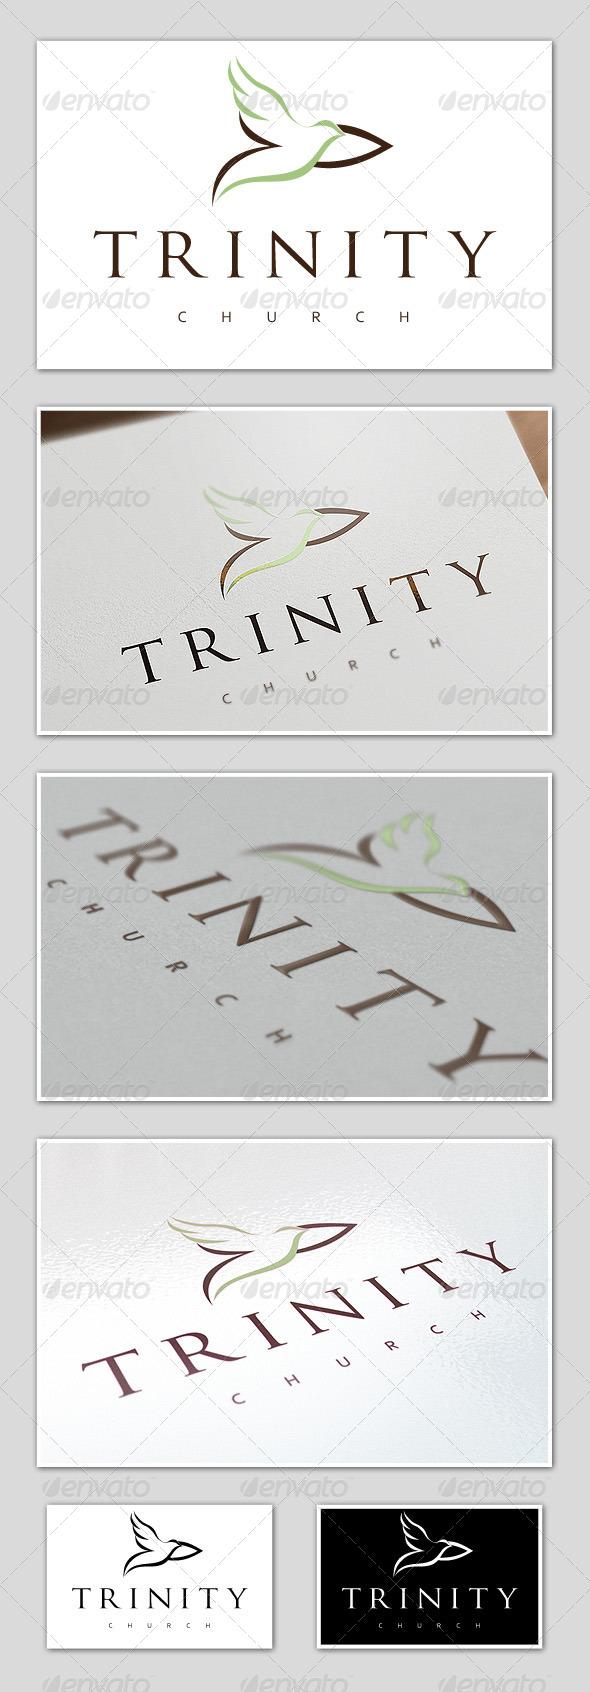 GraphicRiver Trinity Church Logo Template 4666433